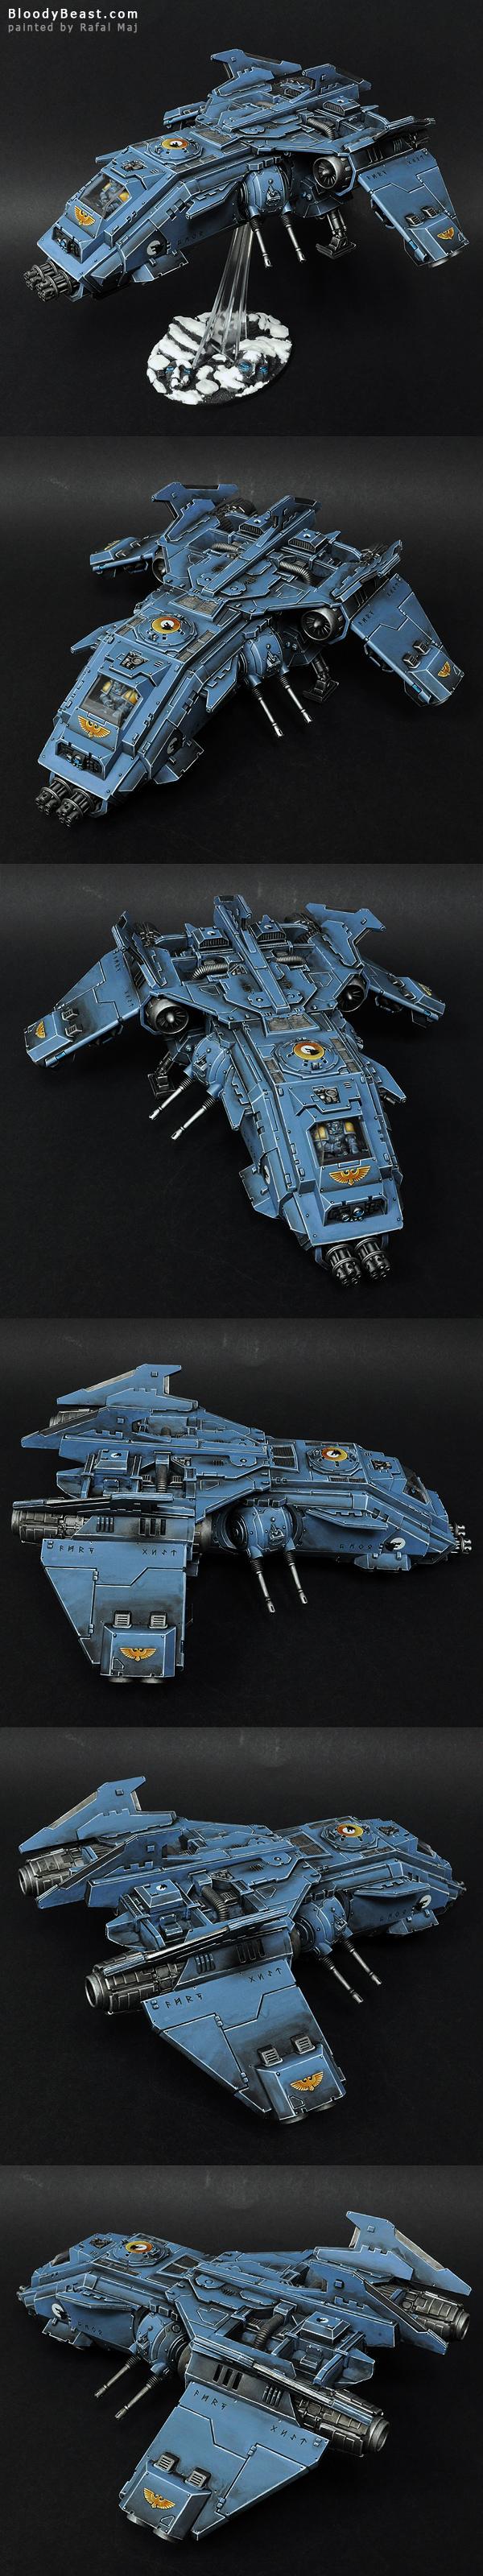 Space Wolves Fire Raptor Gunship painted by Rafal Maj (BloodyBeast.com)